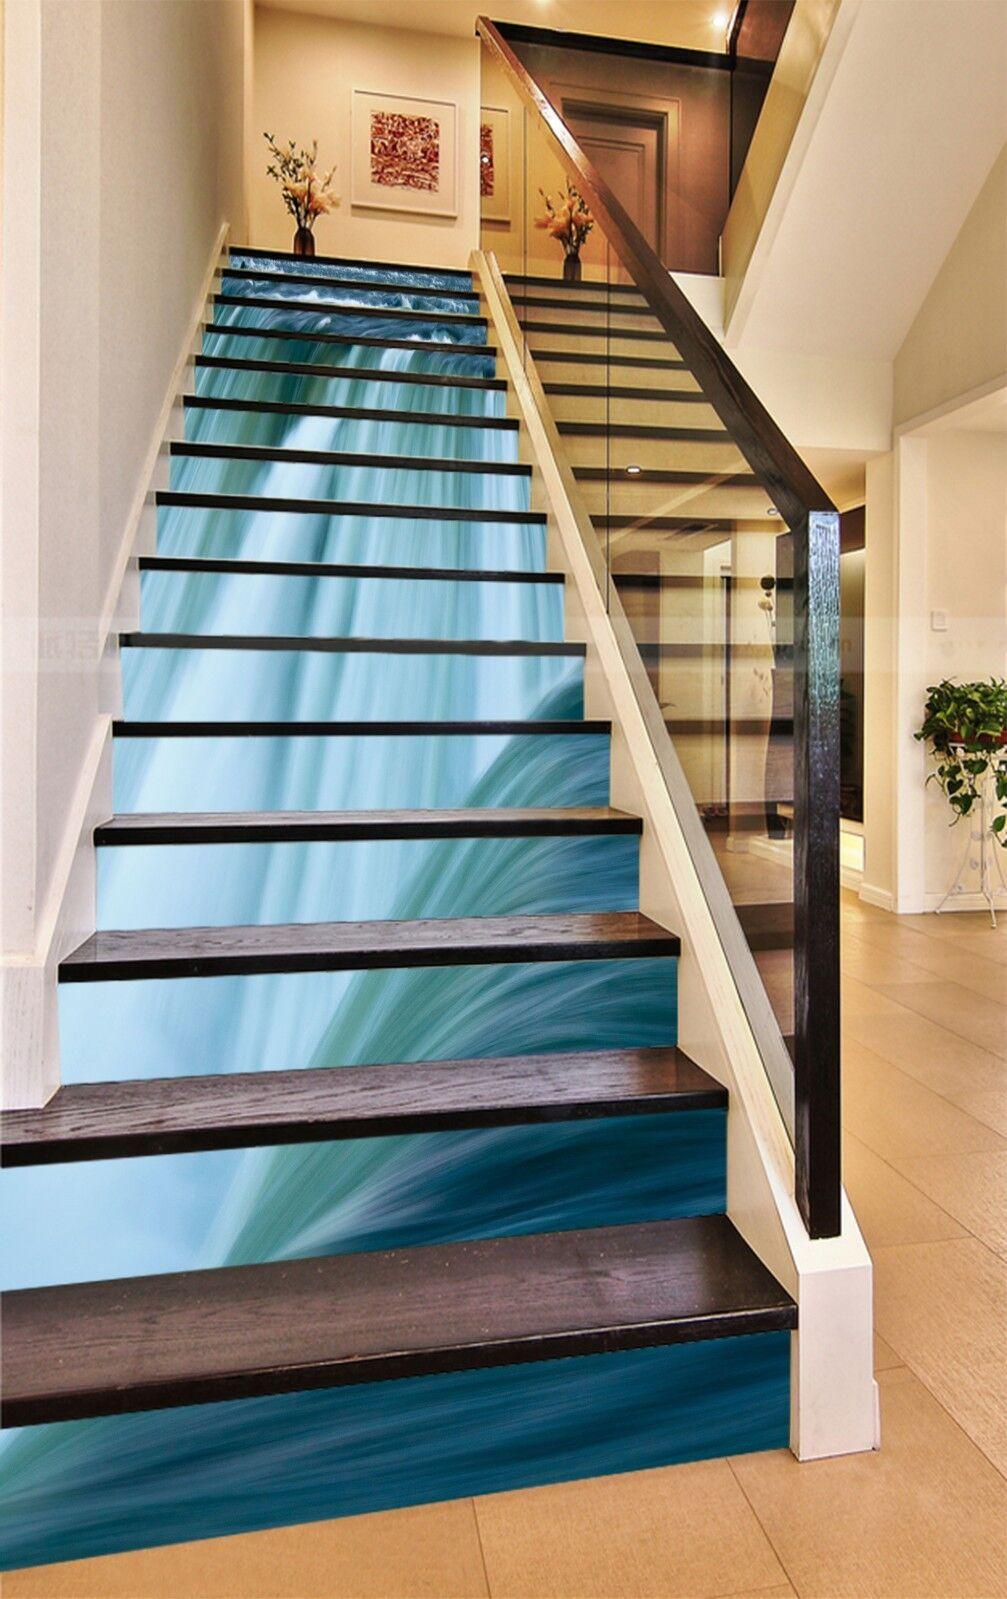 3D Blau current 5 Stair Risers Decoration Photo Mural Vinyl Decal Wallpaper UK